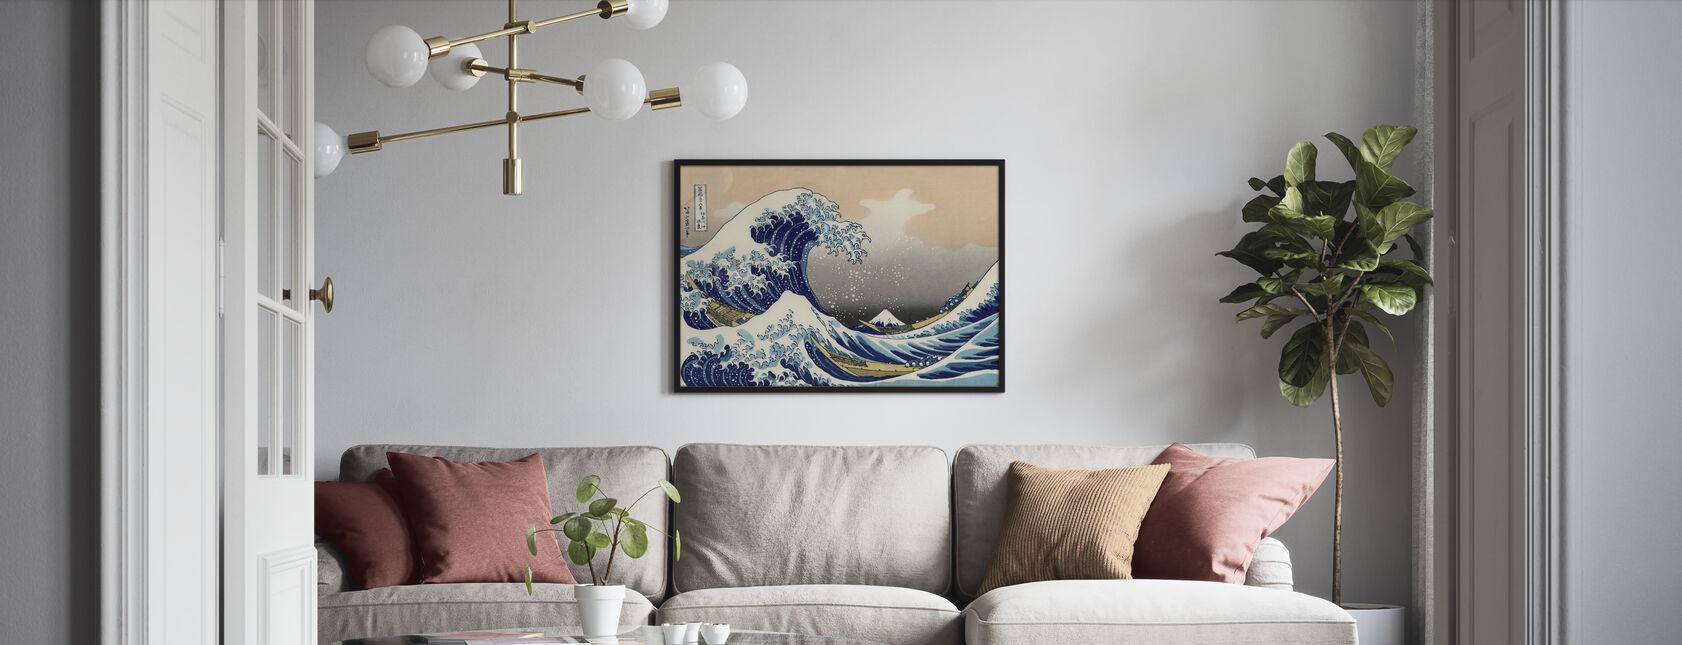 Grande Vague, Katsushika Hokusai - Impression encadree - Salle à manger